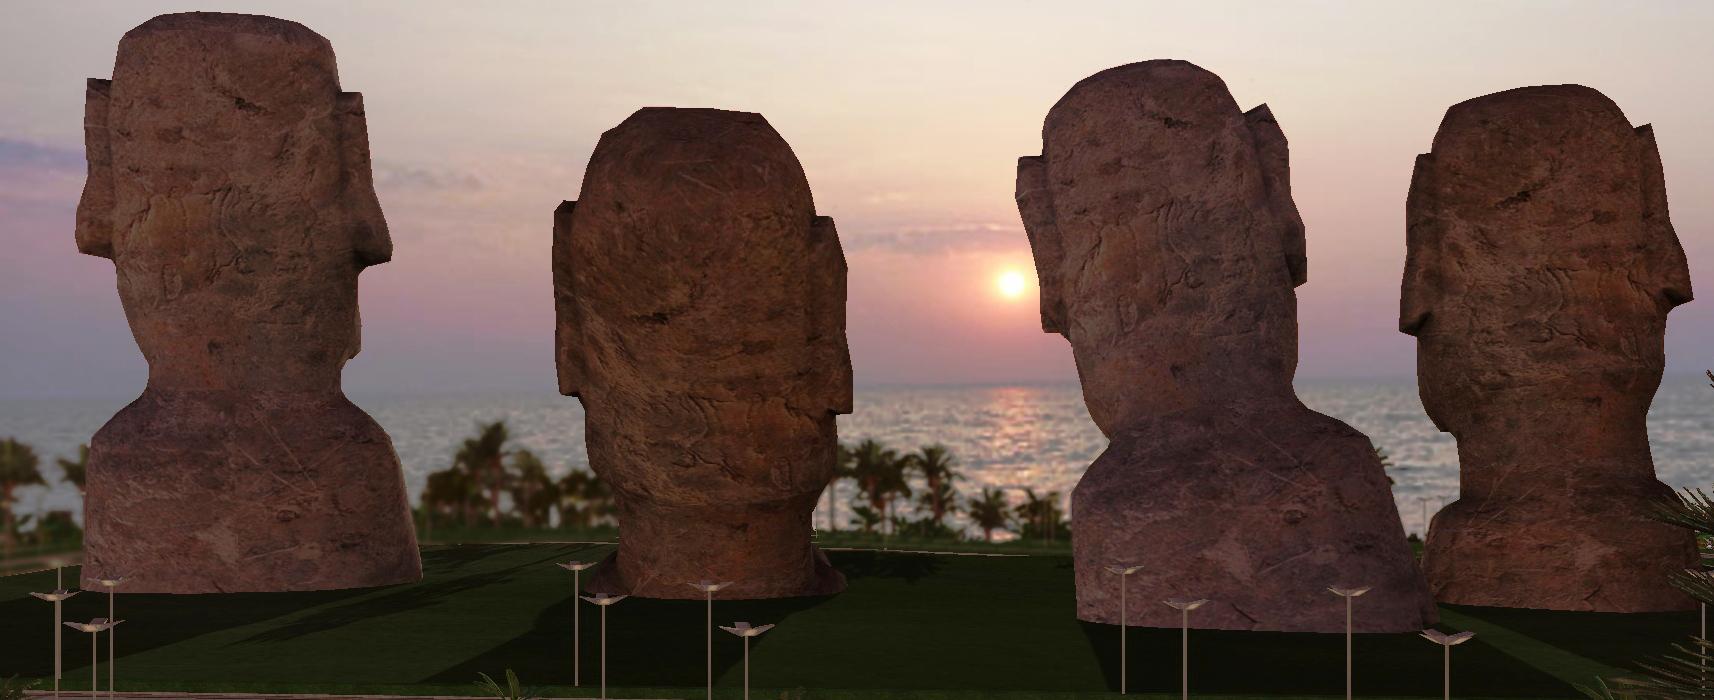 spec statues-look-to-sea.jpg